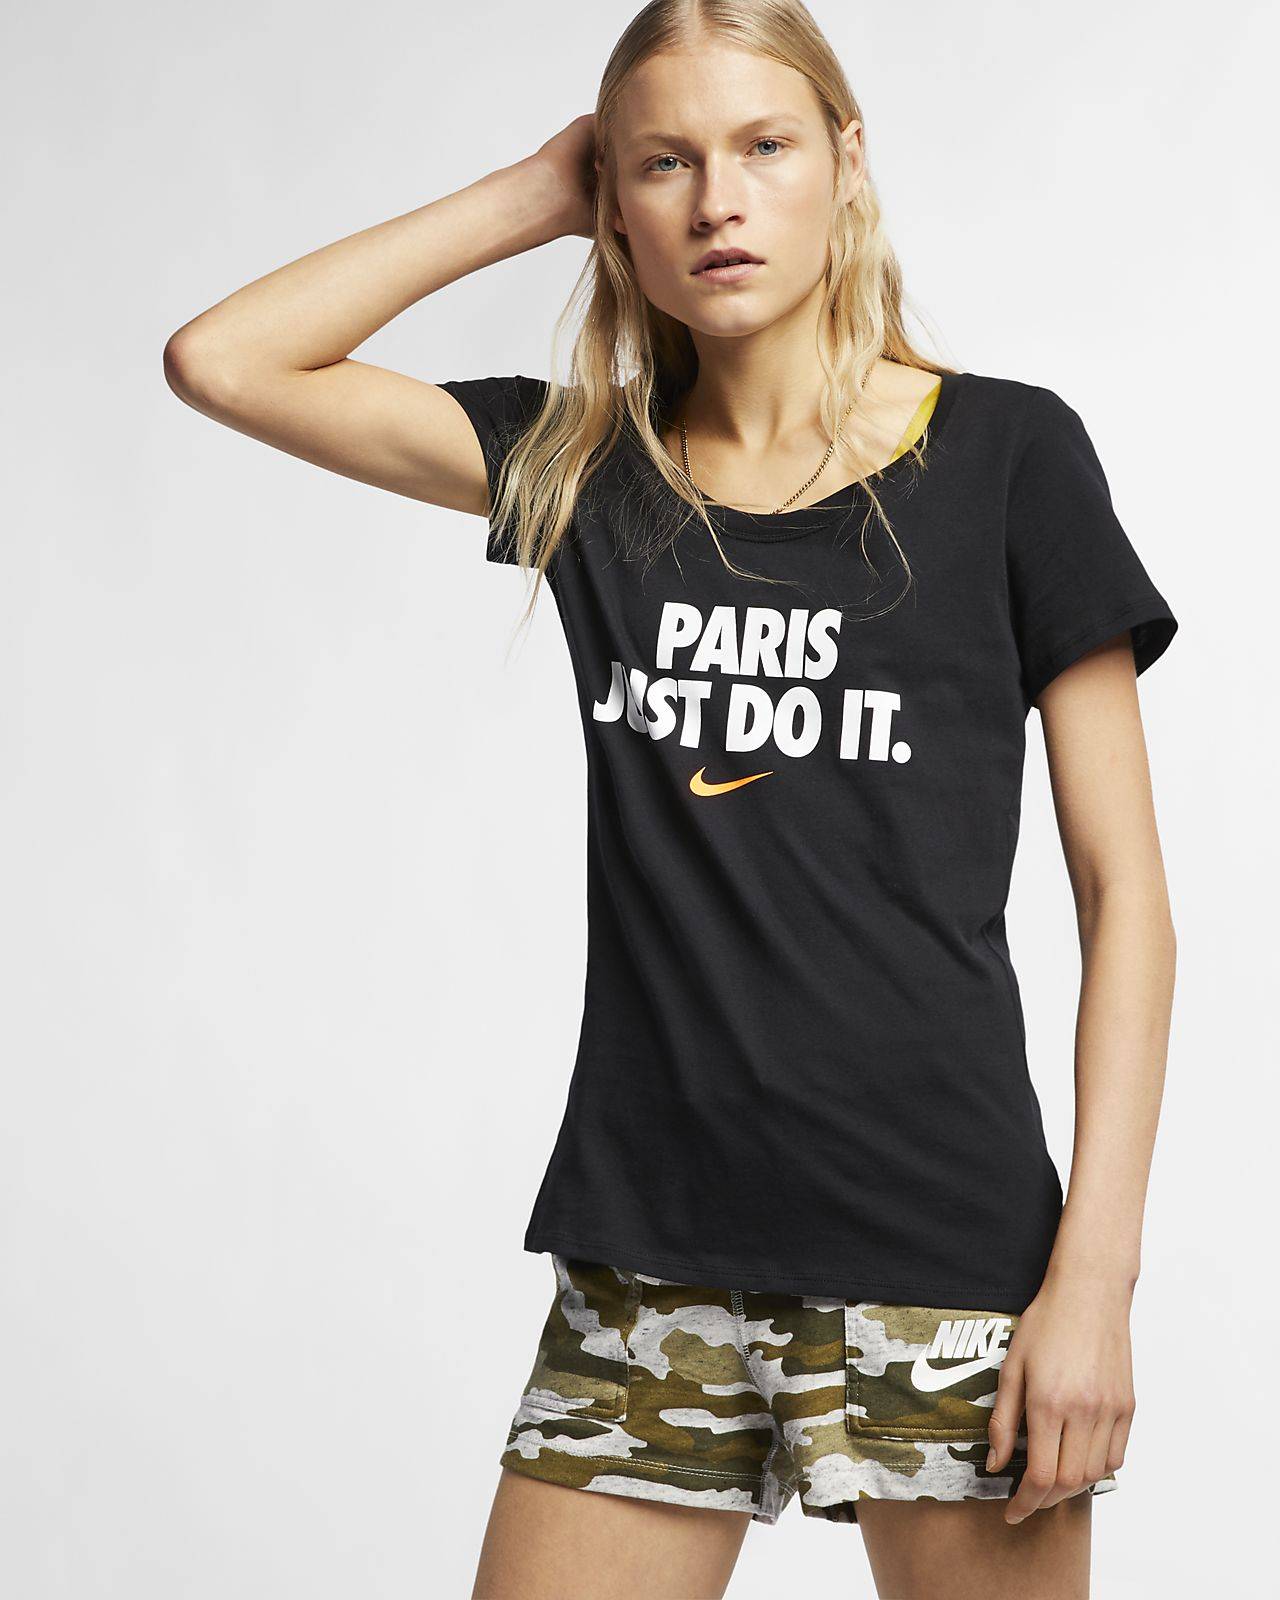 nike femme paris